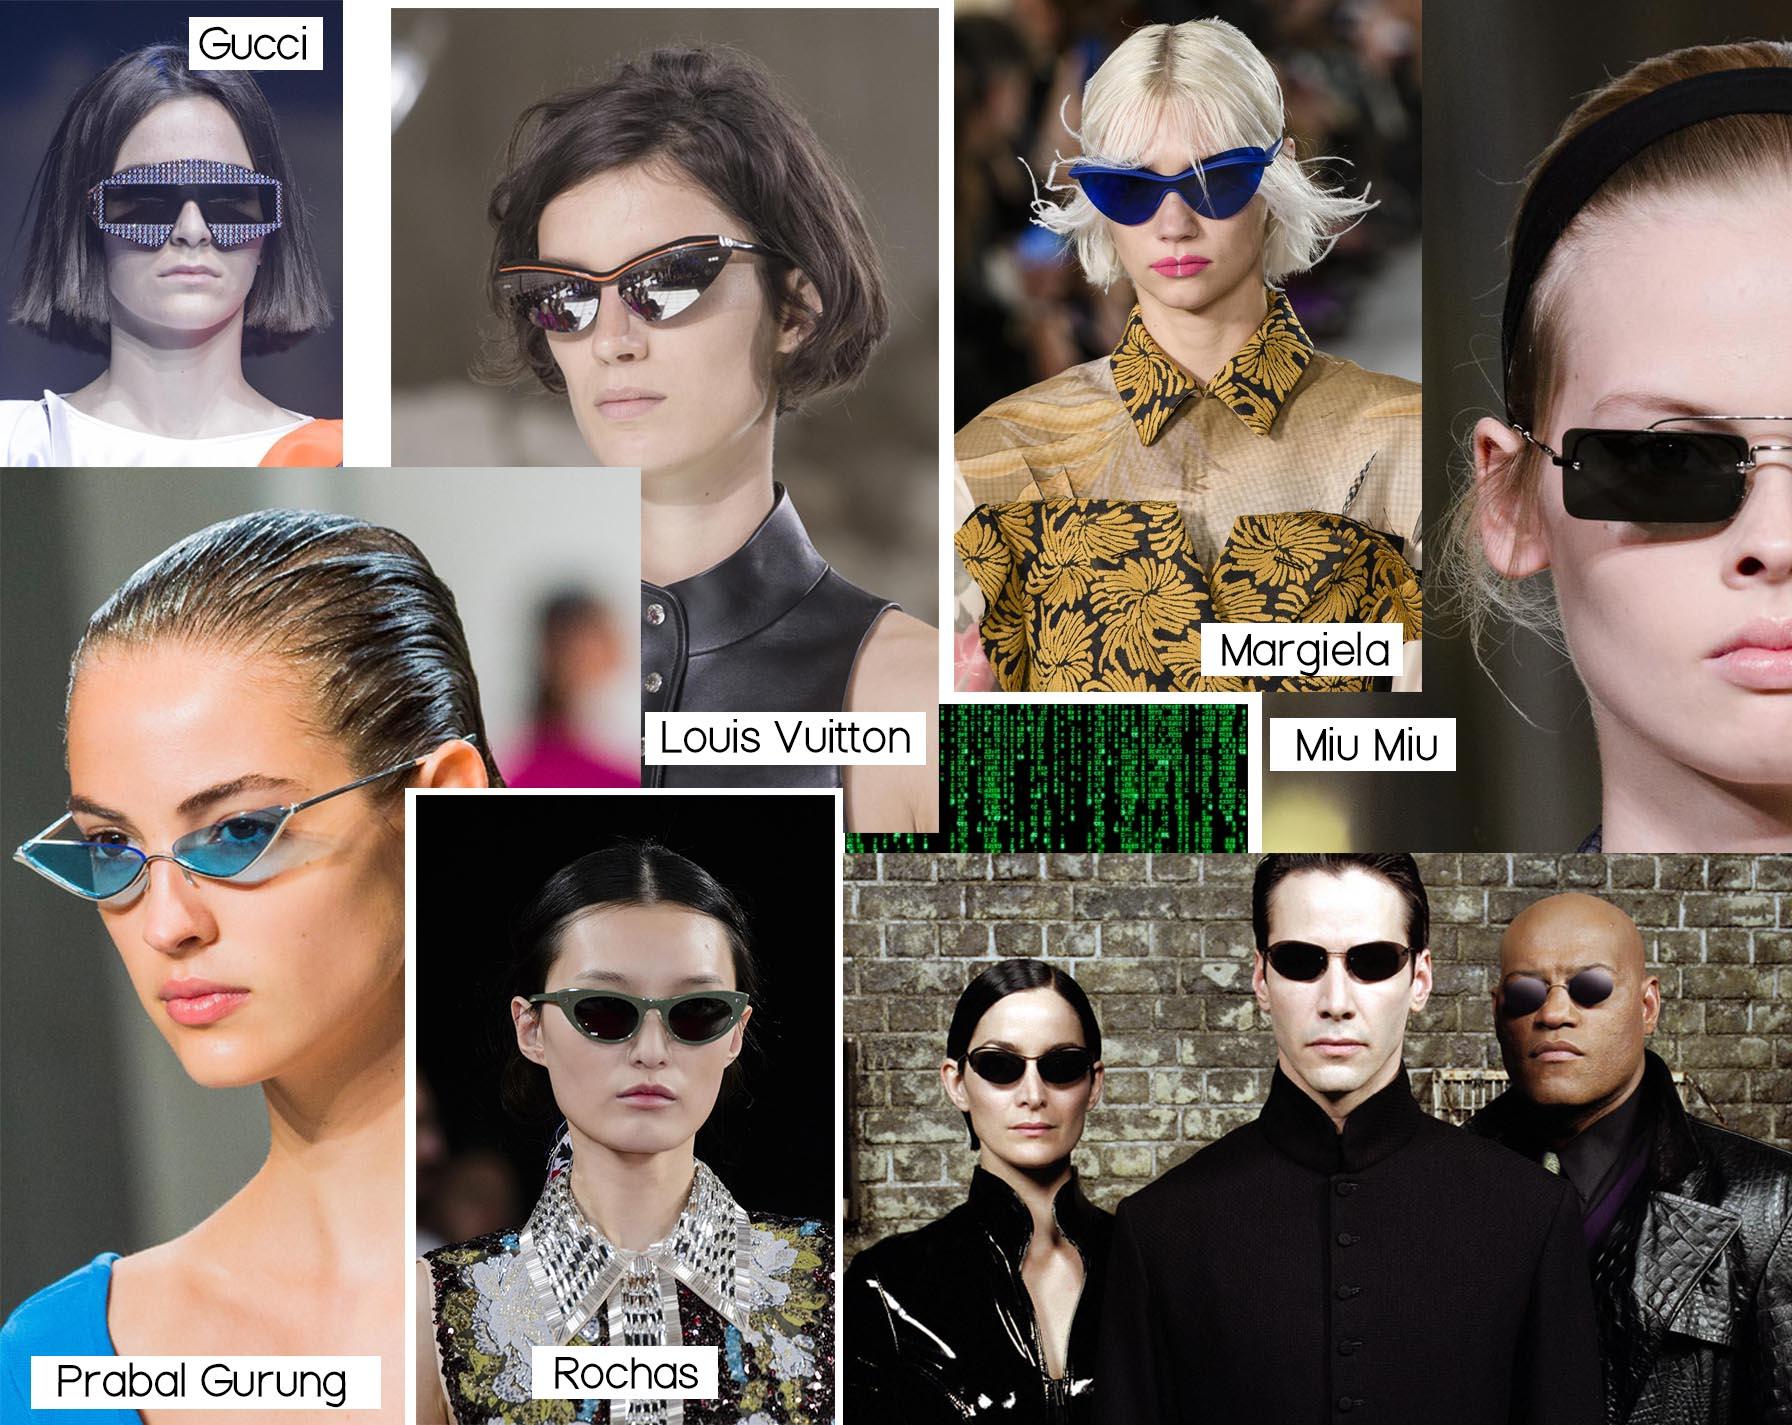 lunettes du turfu 2018